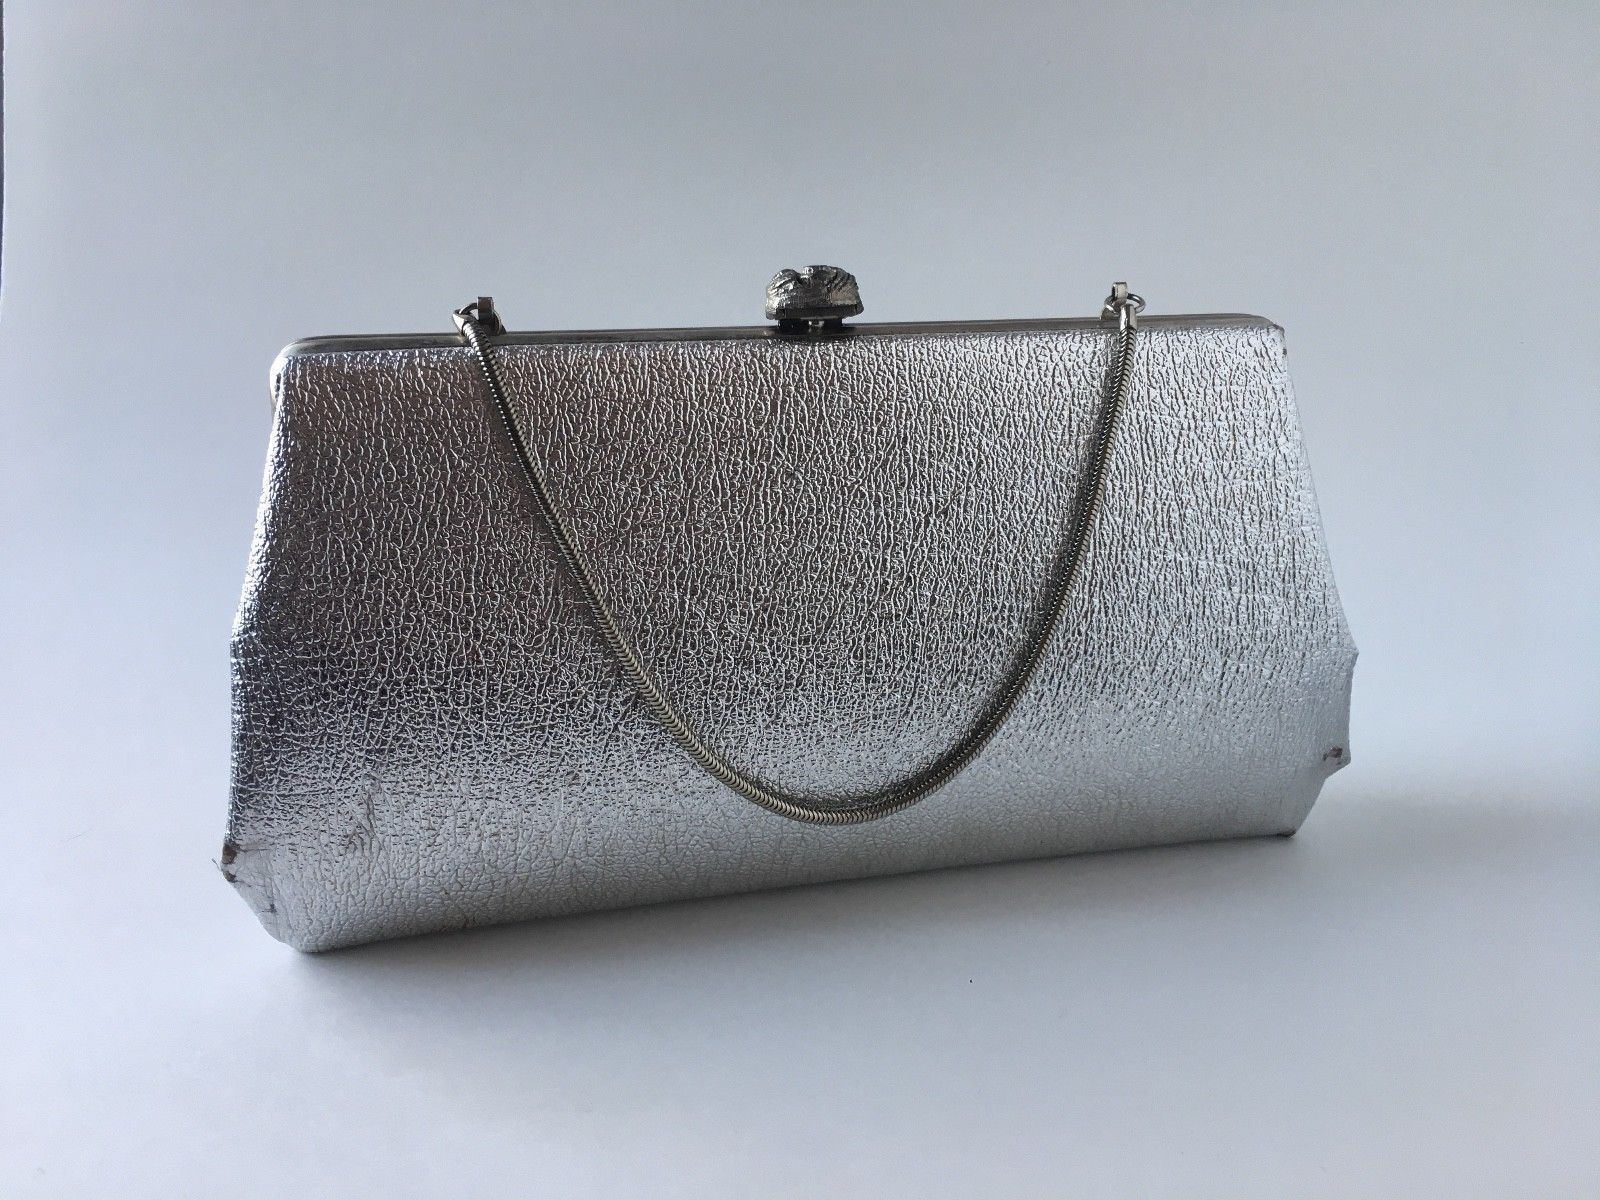 72baf414cf1f Vintage Silver Clutch Evening Bag Minaudière with Chain Purse 1950s 1960s   purses1950s  1950seveningbags